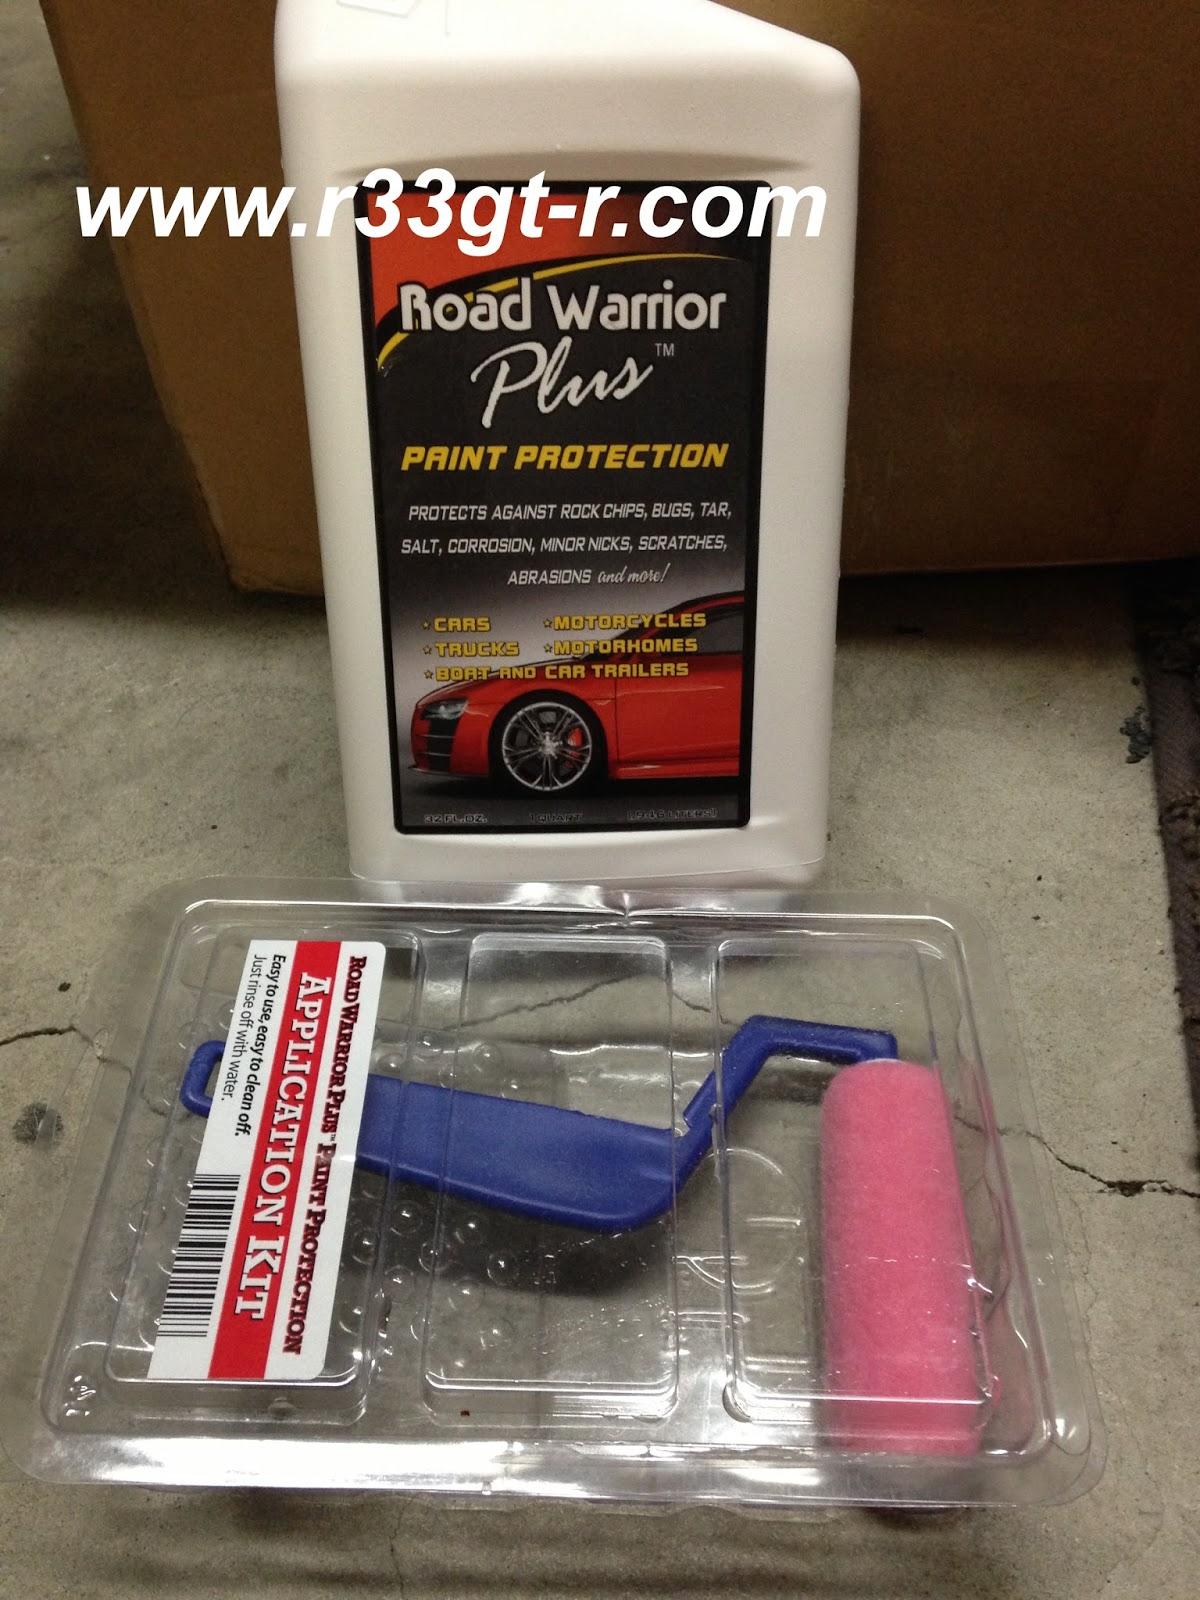 Road Warrior Plus Paint Protection Applicator Kit